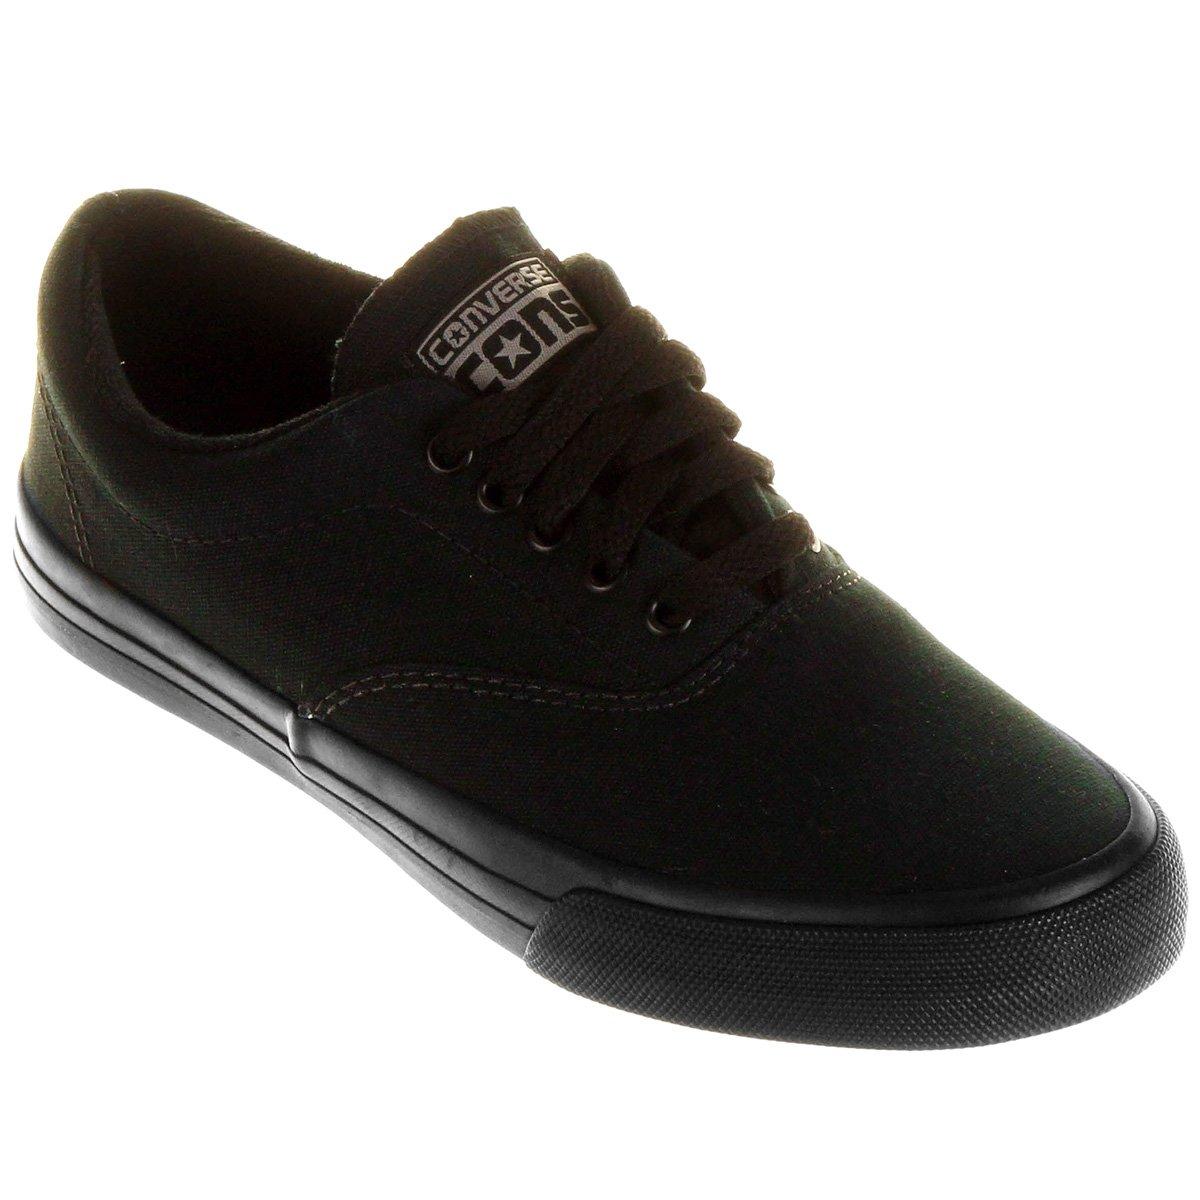 0ec6572fcbac6c ... ox 7ece9 9a658 purchase tênis converse skateboard preto 5150c b0592 ...